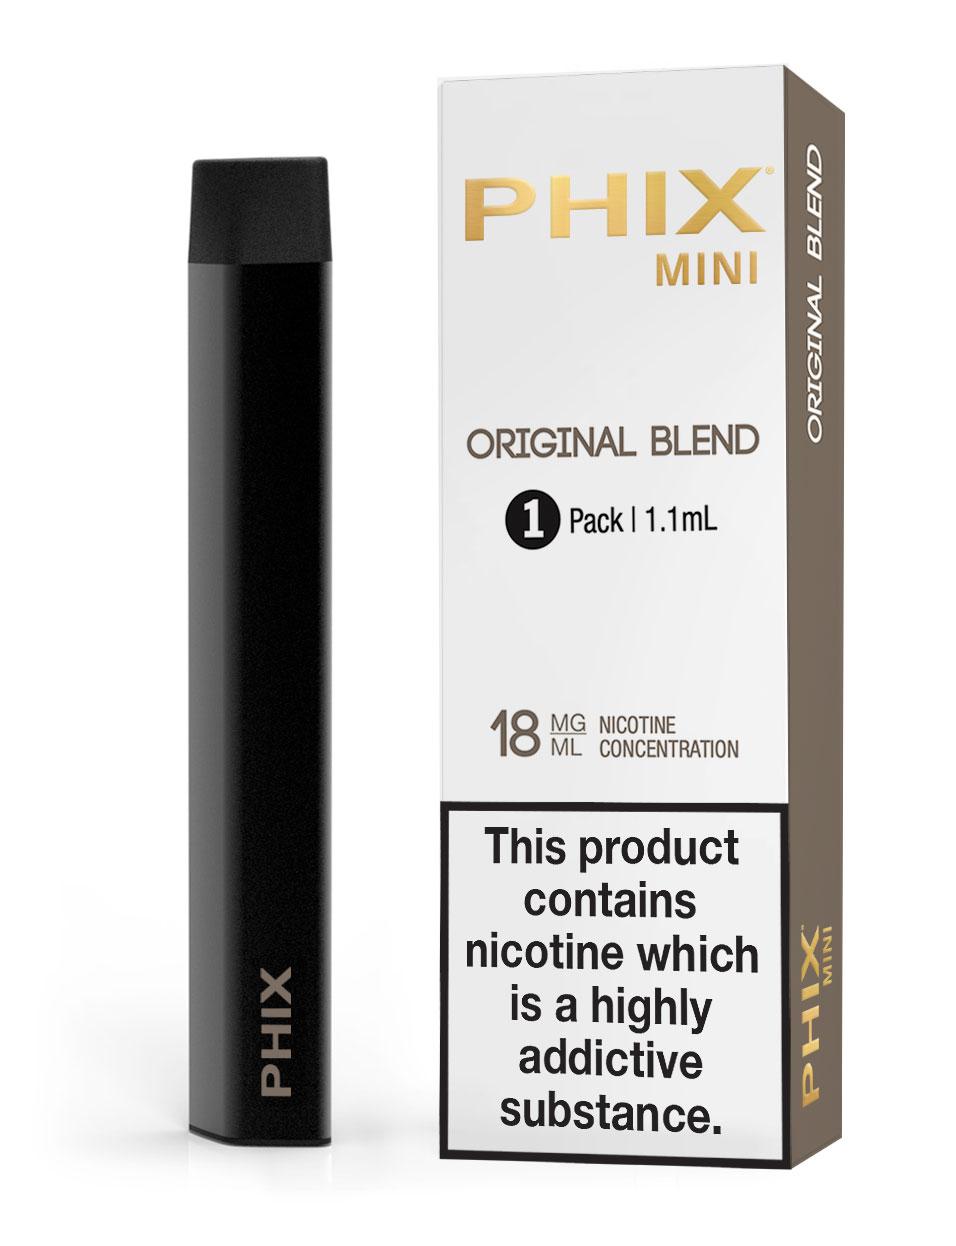 Original Blend - PHIX Mini